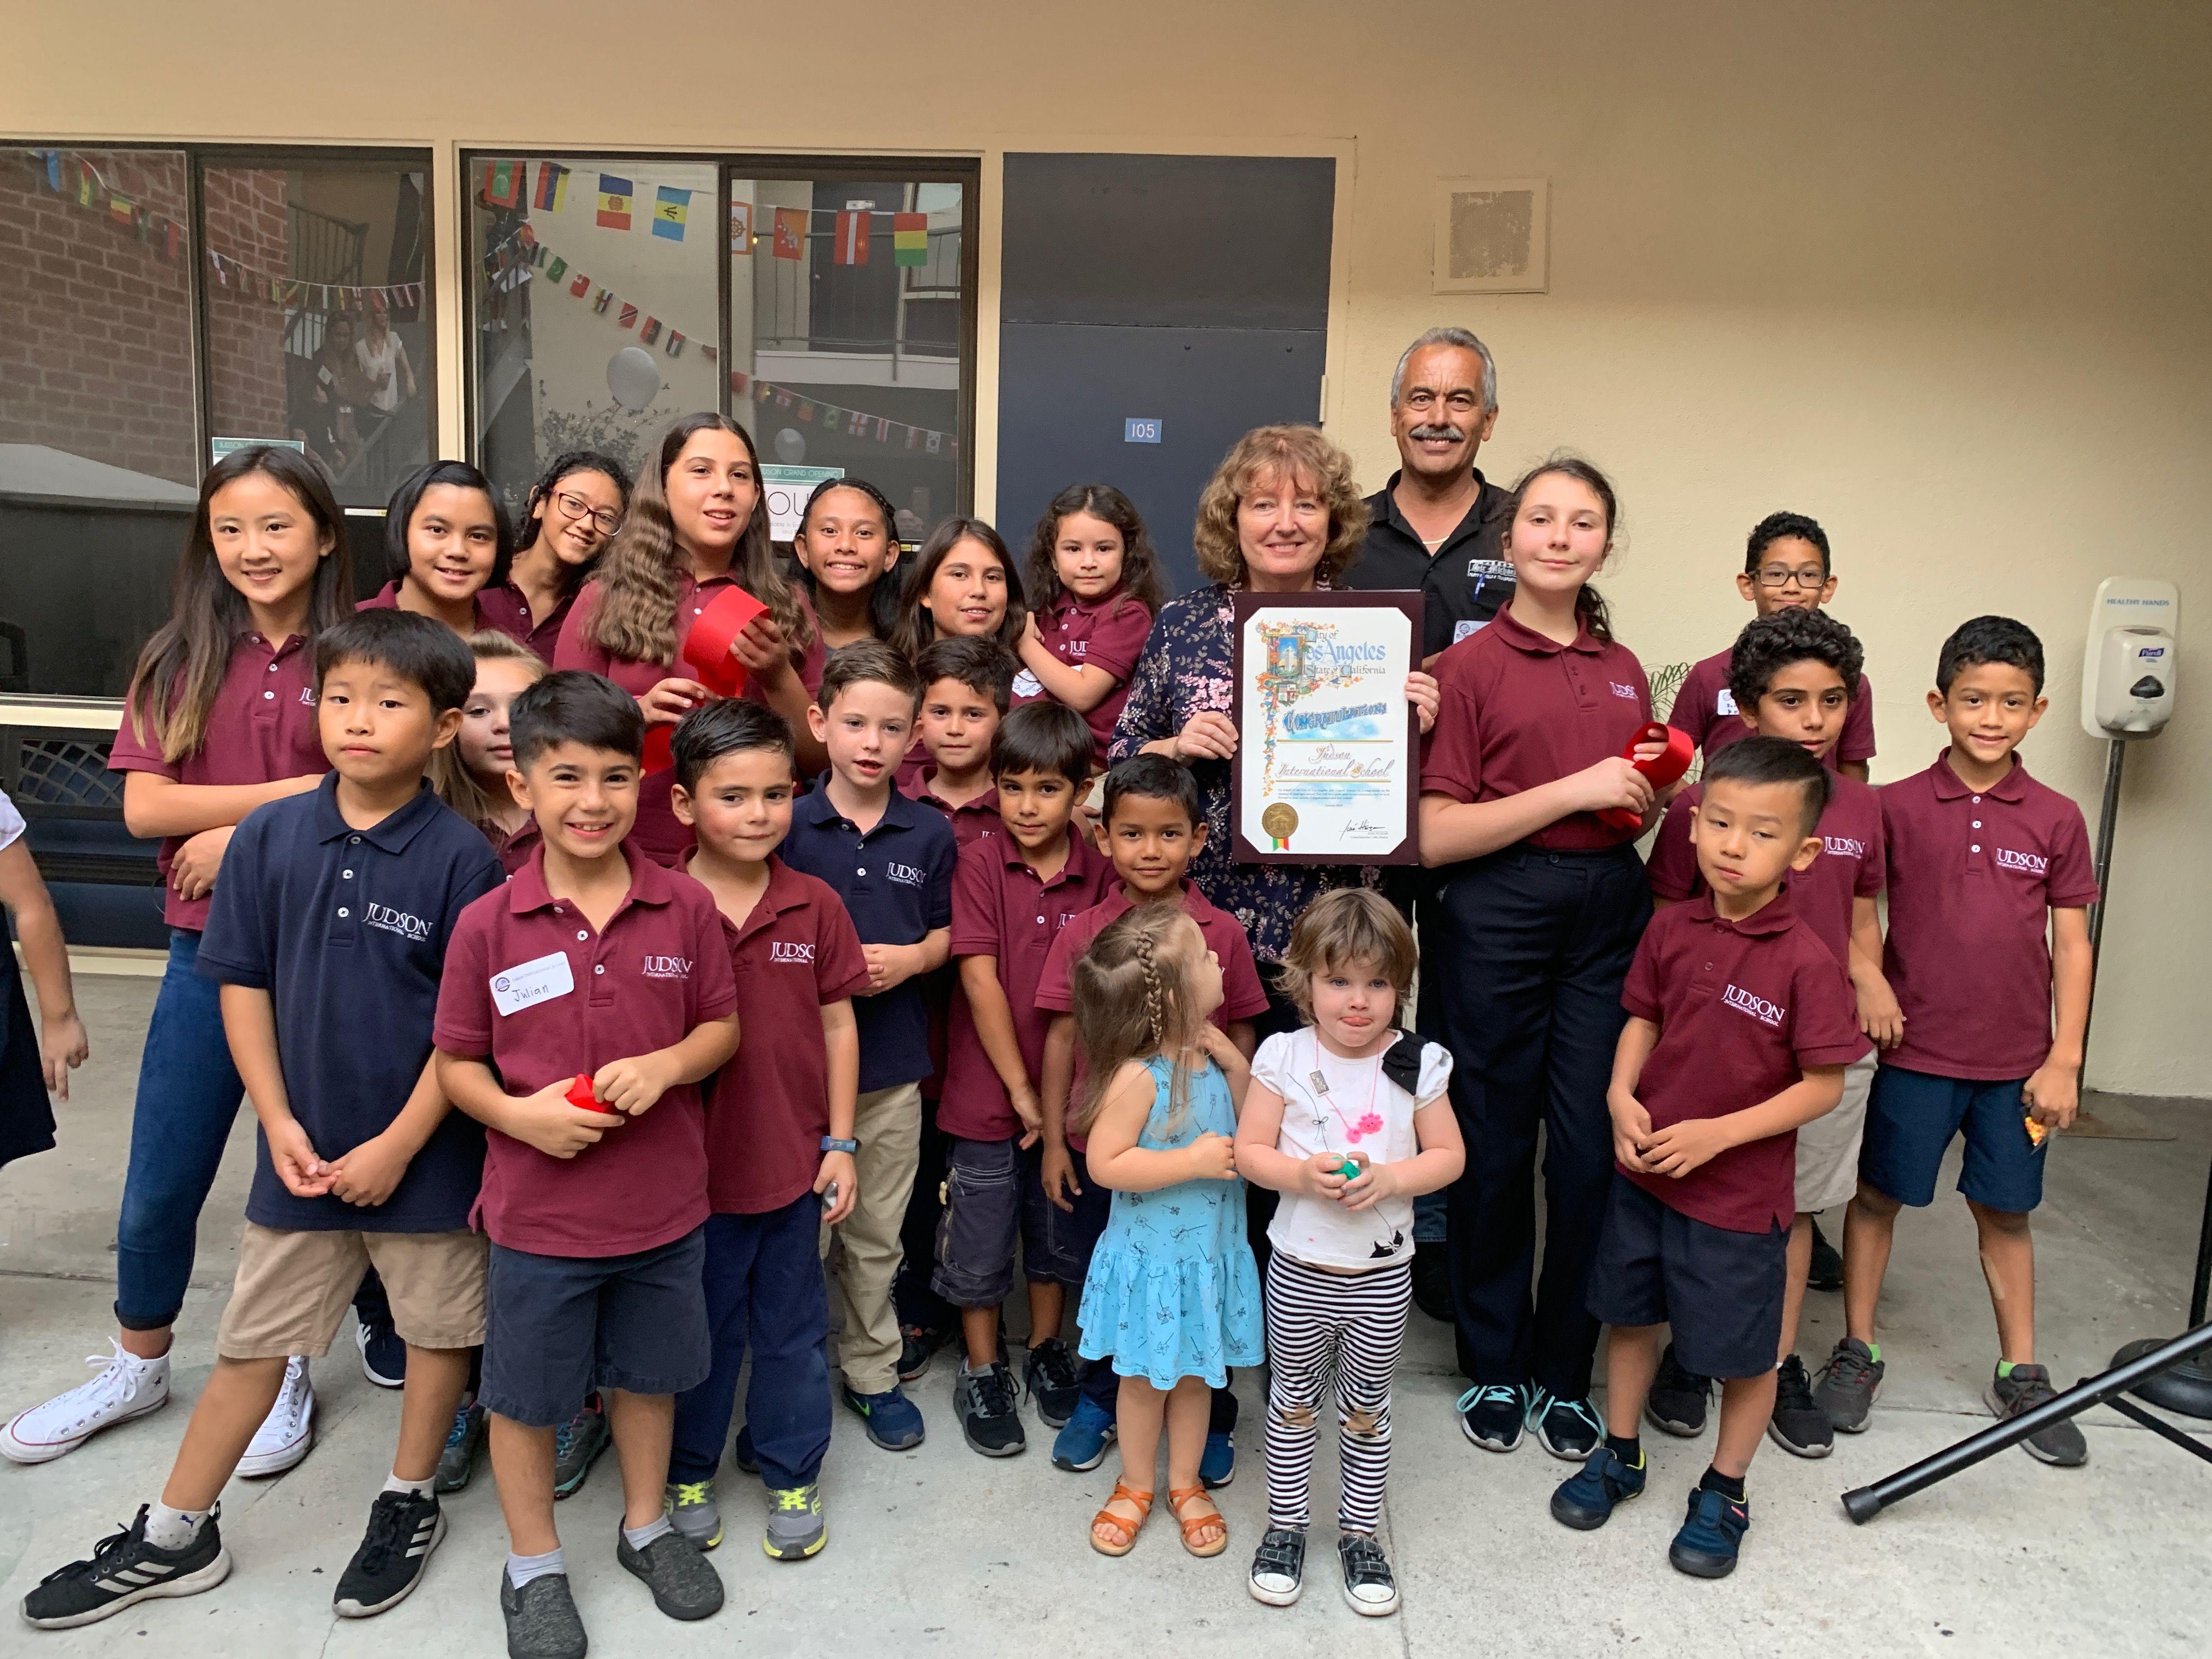 Eagle Rock Grand Opening for Judson International School image 2